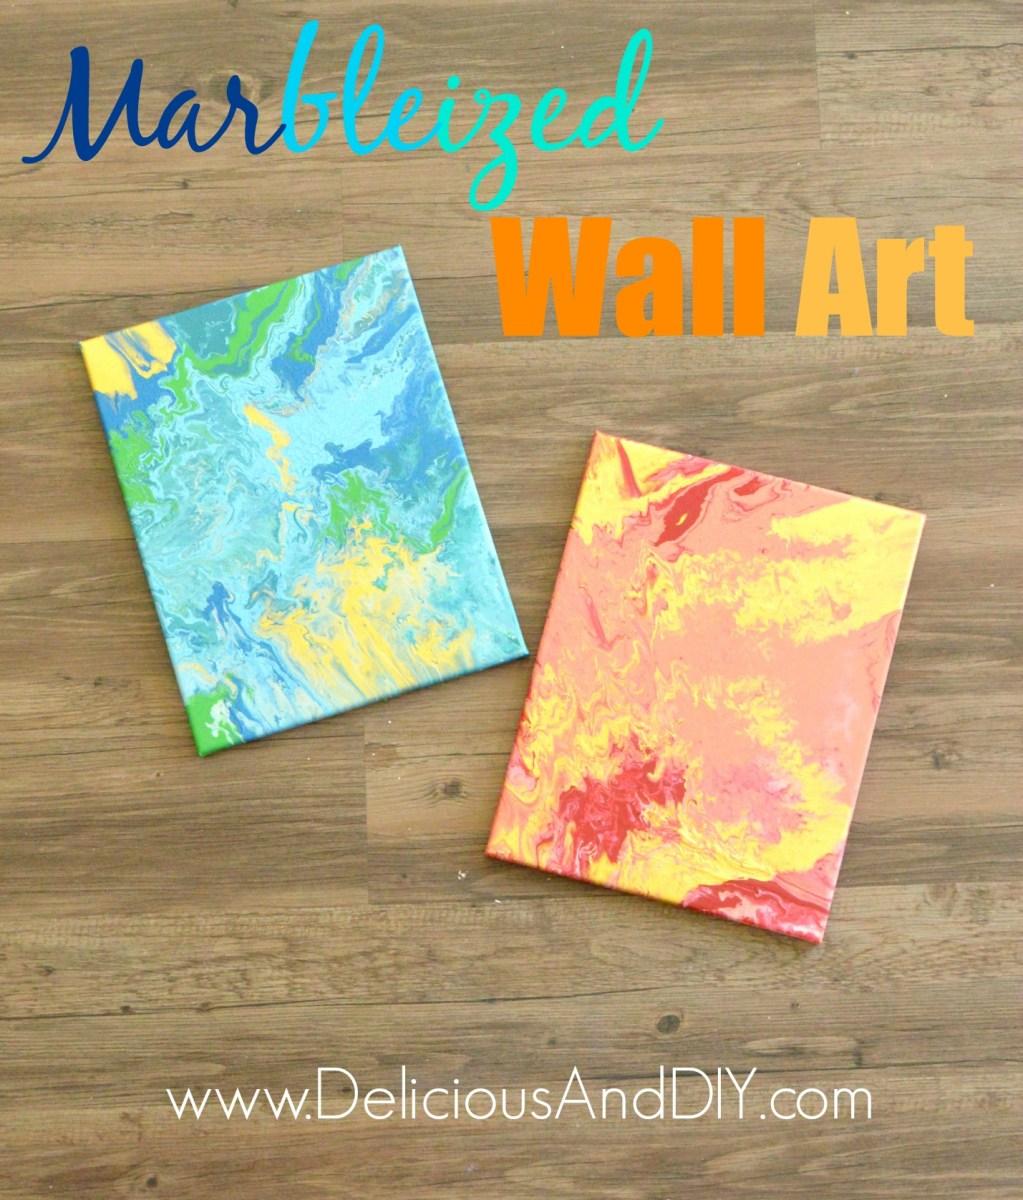 Marbleized Wall Art